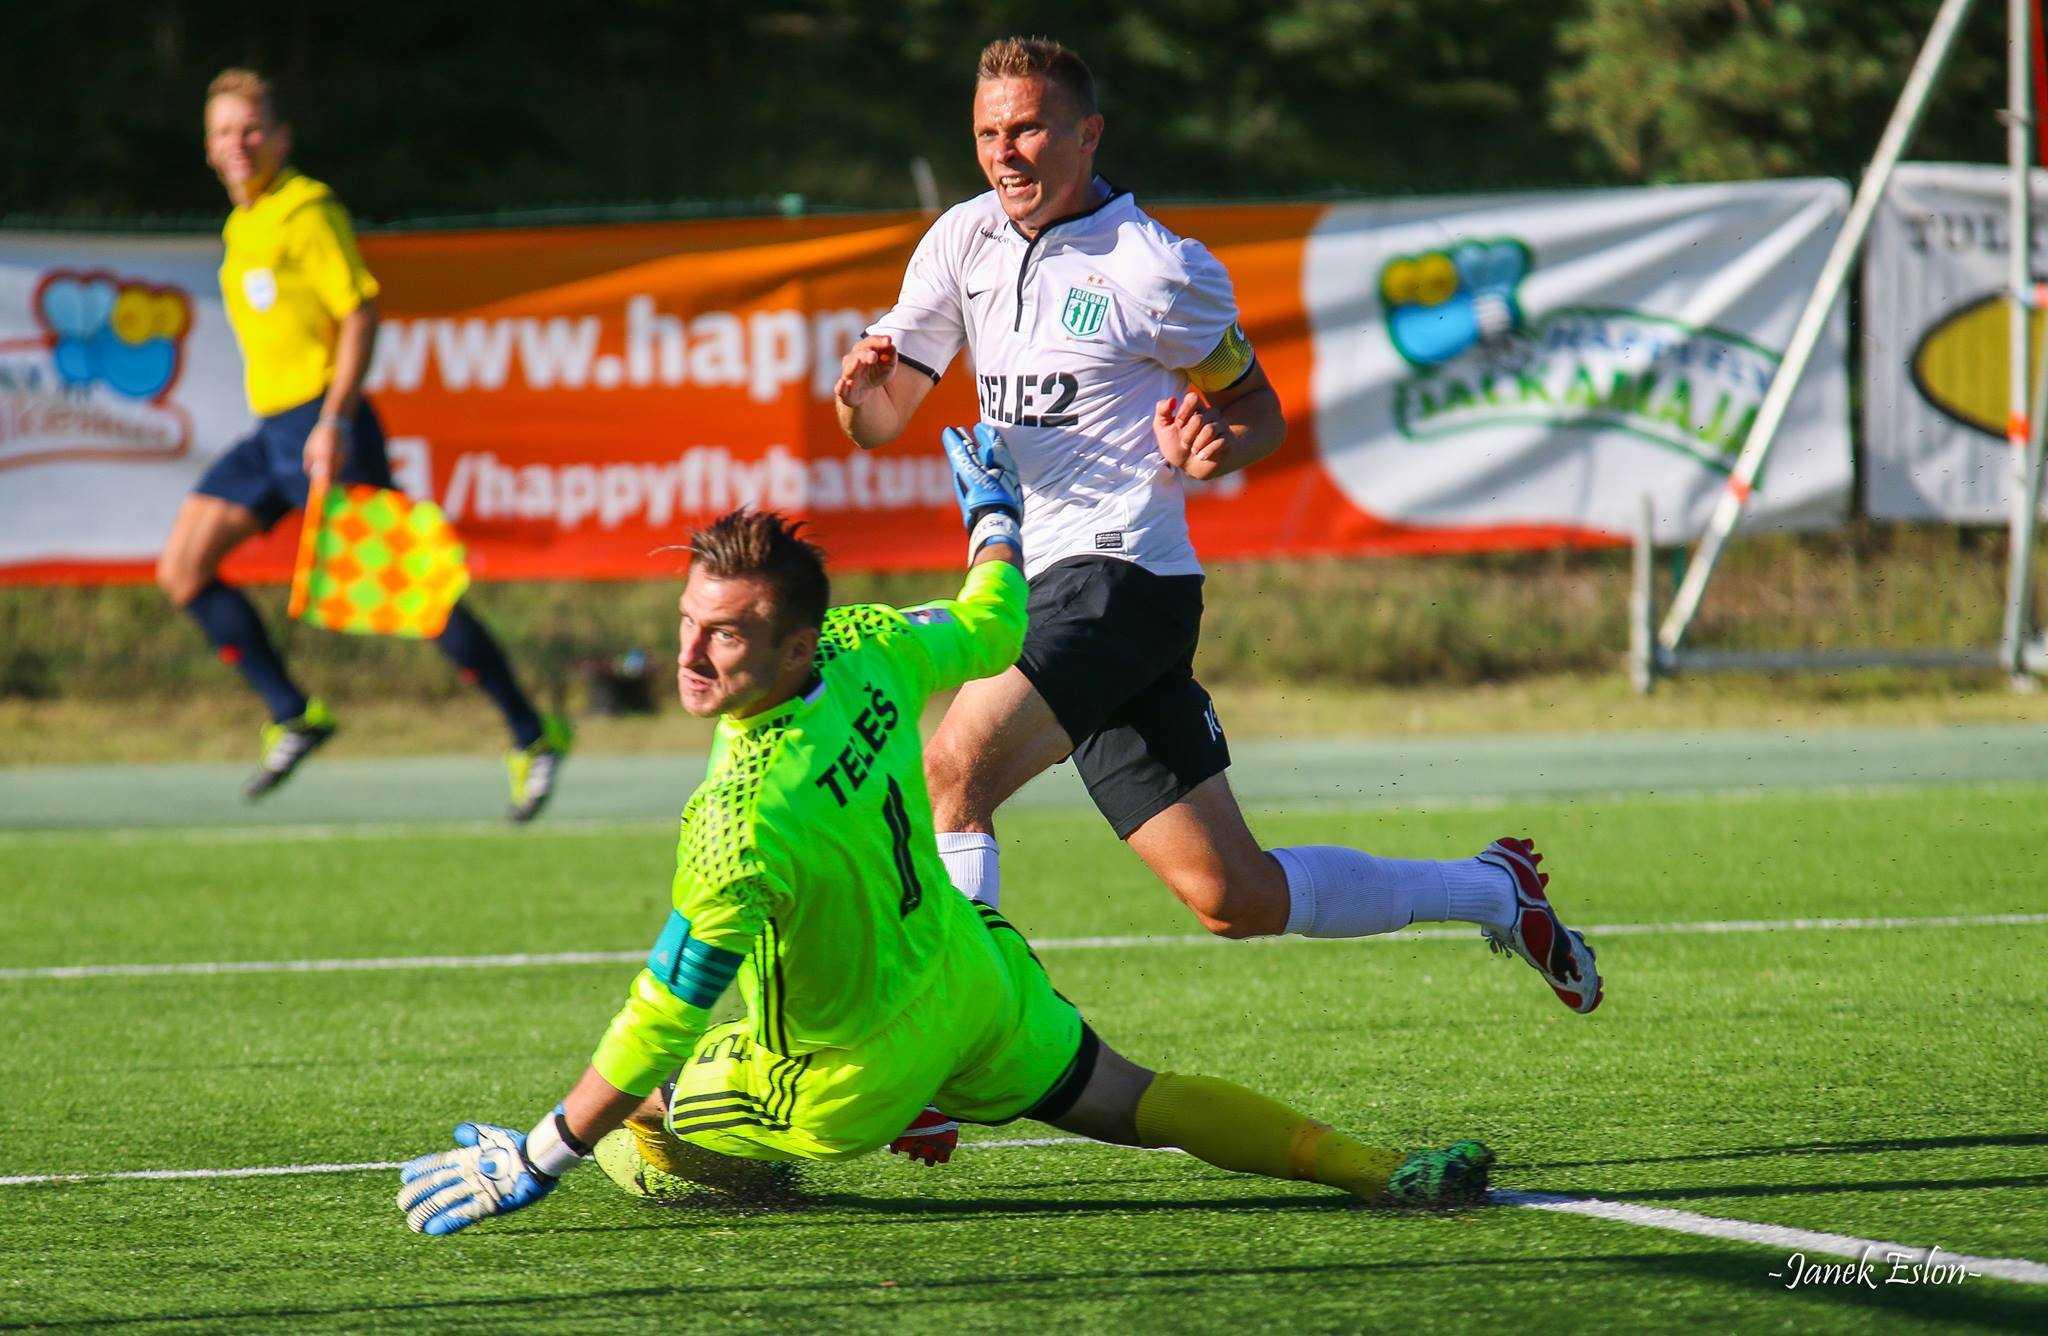 Gert Kams vs Kalju, 3-3, 27.08.2016 Hiiu staadionil